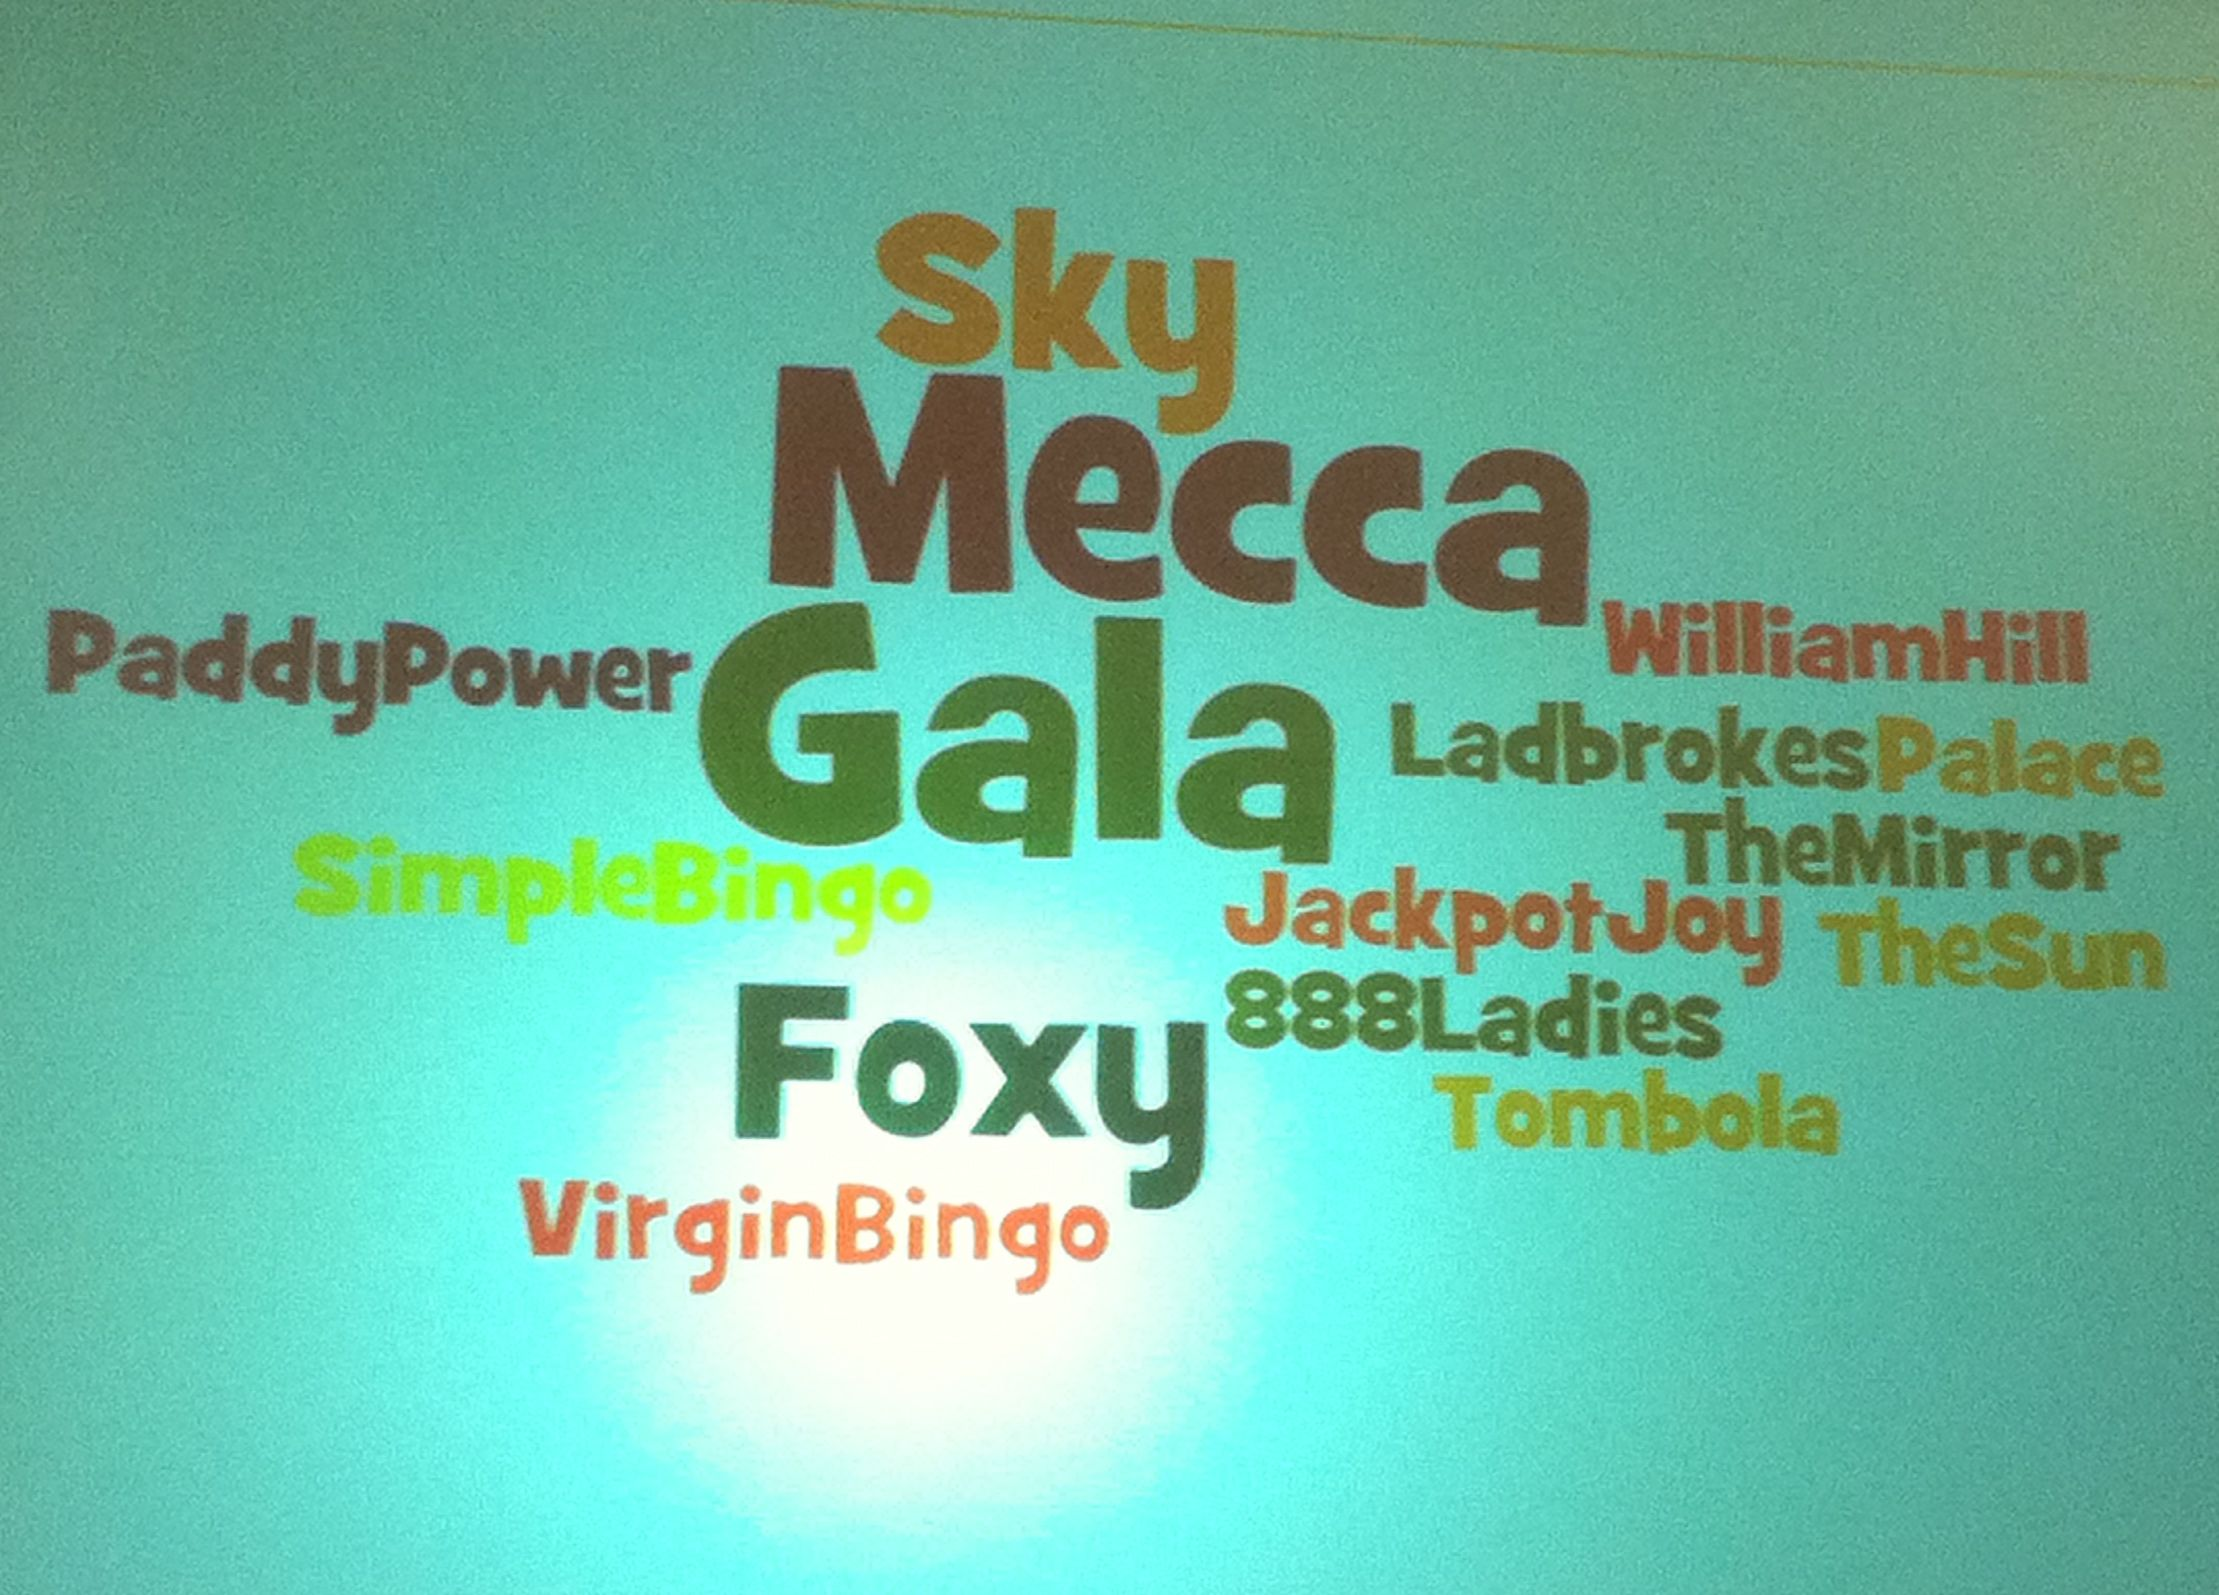 Online Bingo Summit & Awards 2011 Review